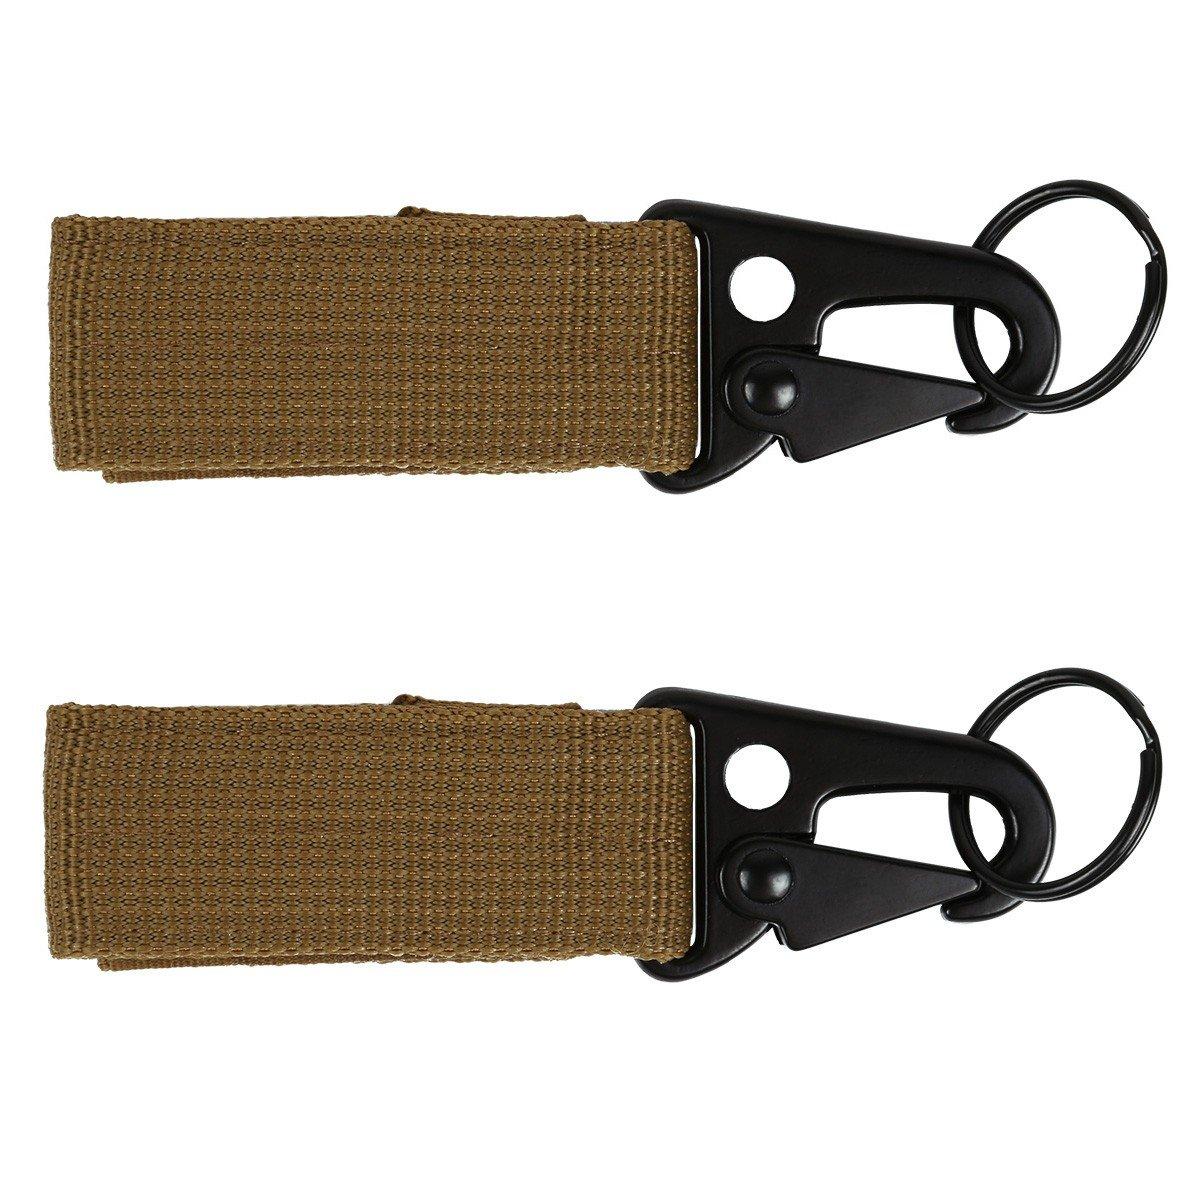 iiniim Tactical Gear Clip Band Gear Keeper Pouch Key Chain Nylon Belt Keychain EDC Molle Webbing Key Ring Holder Military Utility Hanger Keychain Hook